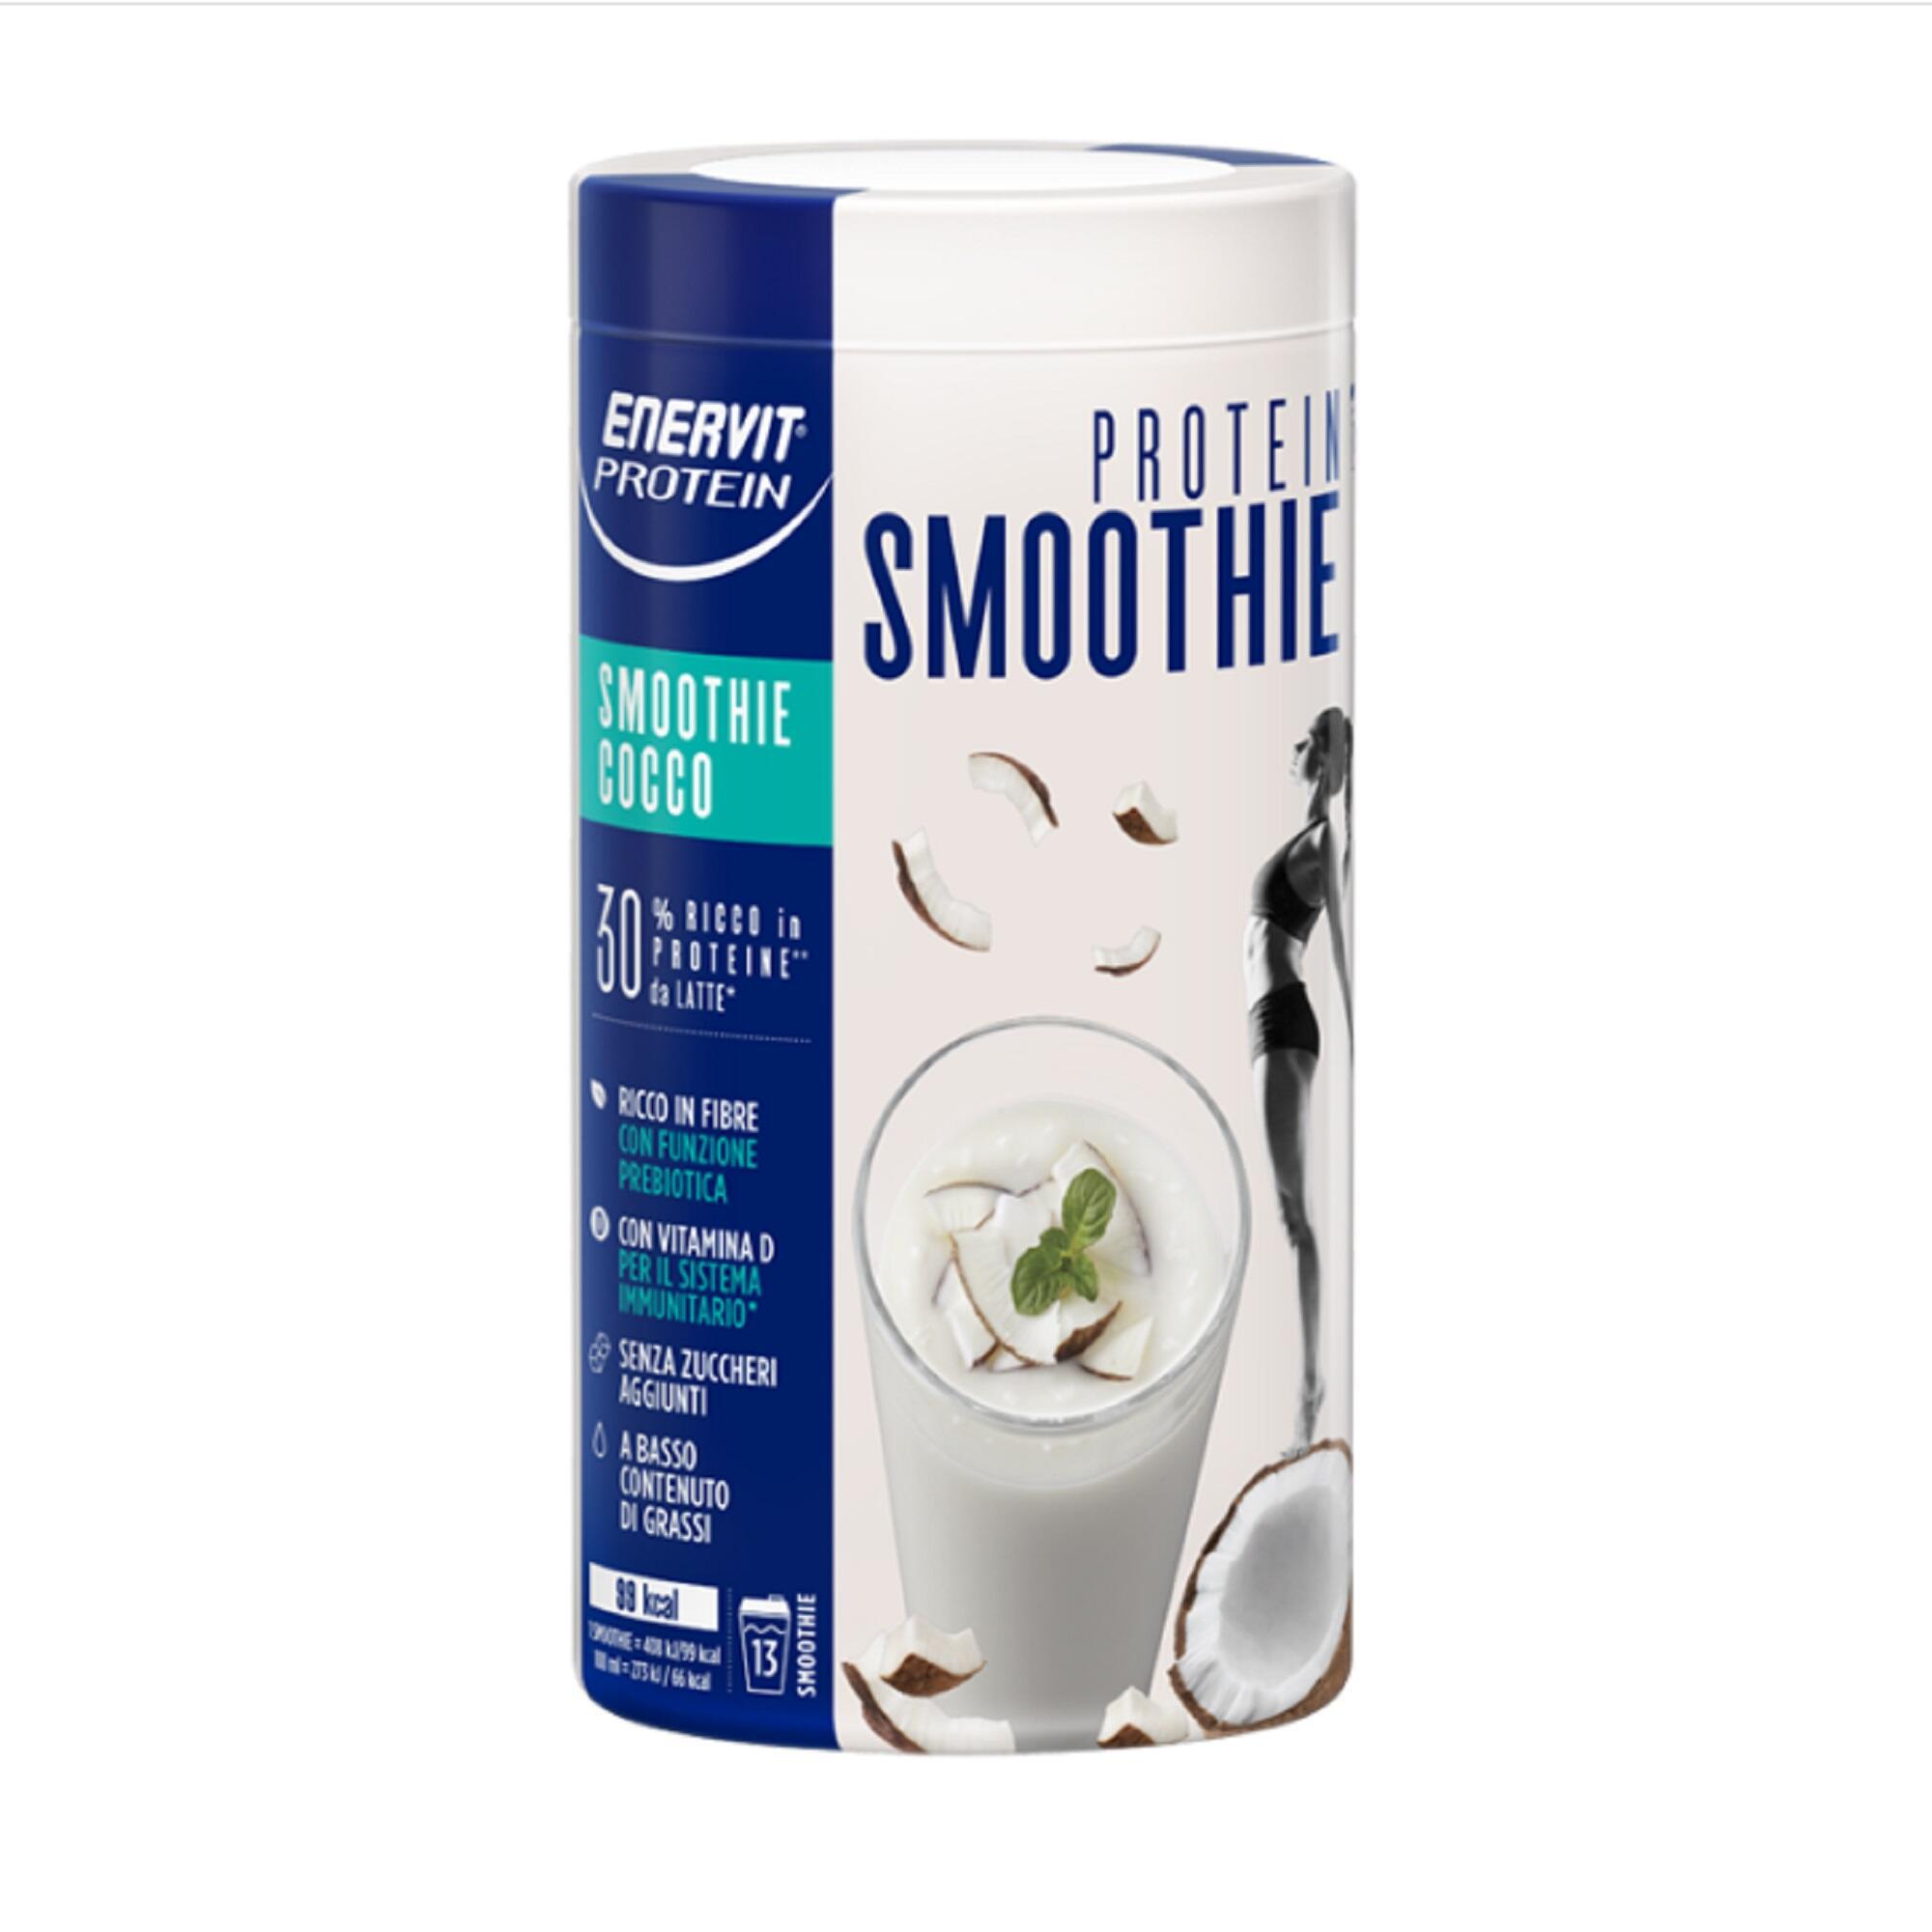 ENERVIT. Smoothie proteico bevanda al cocco proteica vegana senza grassi.